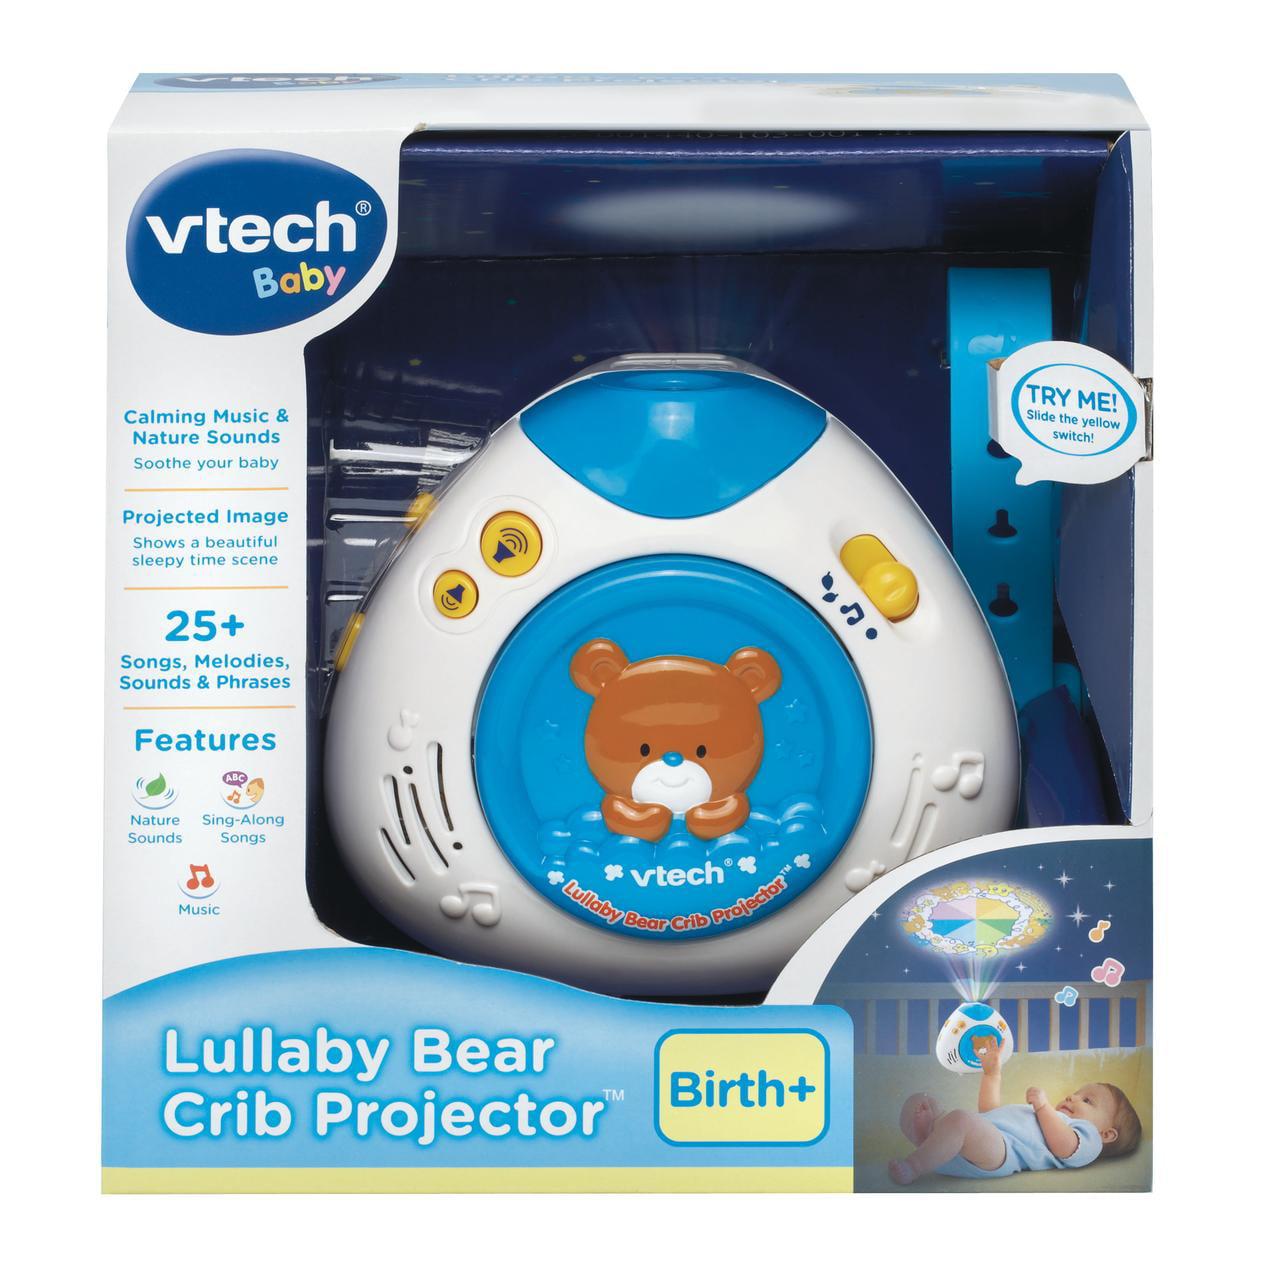 VTech® Lullaby Bear Crib Projector